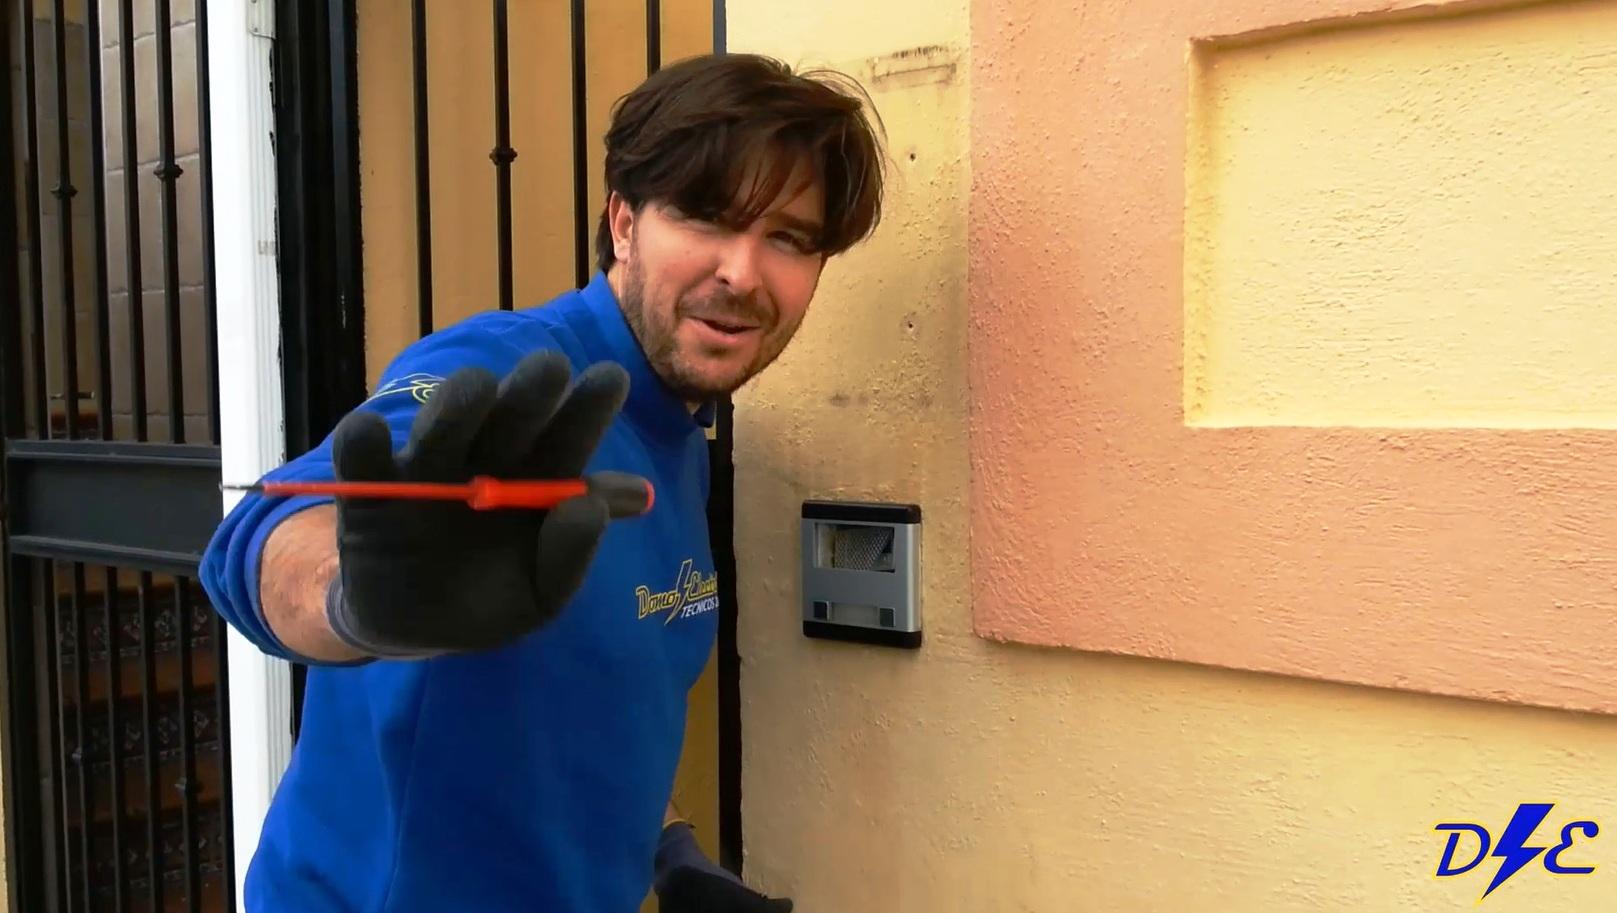 Sustituci n portero autom tico por aver a domo electra for Instalacion portero automatico tegui